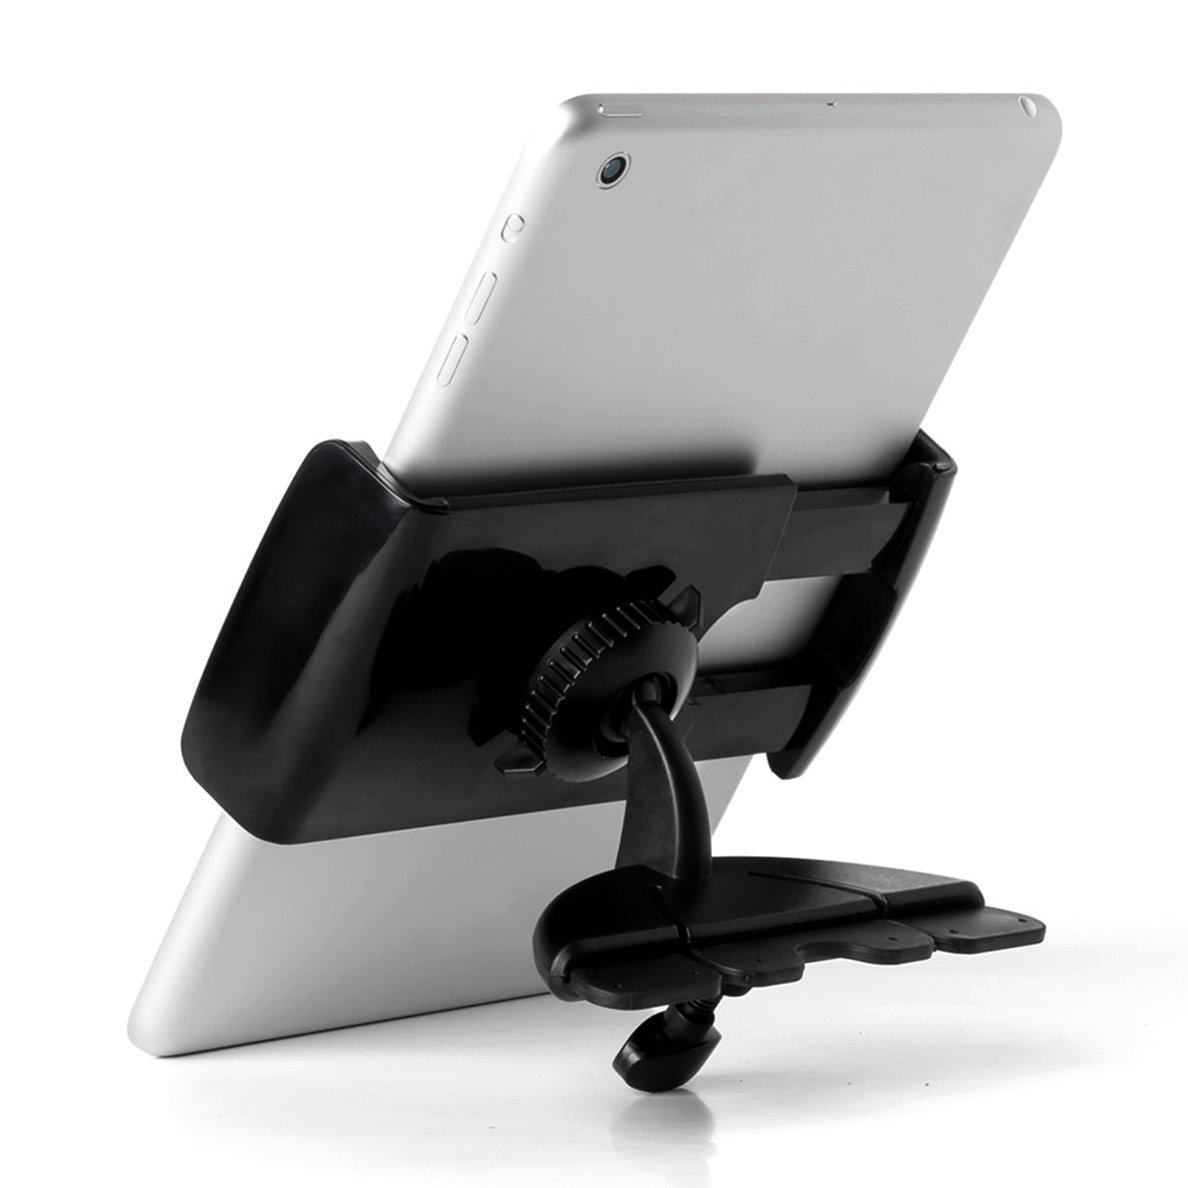 "2 Sizes Phone / Tablet Car Mount DHYSTAR CD Slot Car Holder Cradle Universal 3.5""-5.5"" Smartphone / Cell phone / GPS / iphone 6 6s plus 5s 5, 7"" - 8"" Tablet / ipad mini 1 2 3 4 - Black"